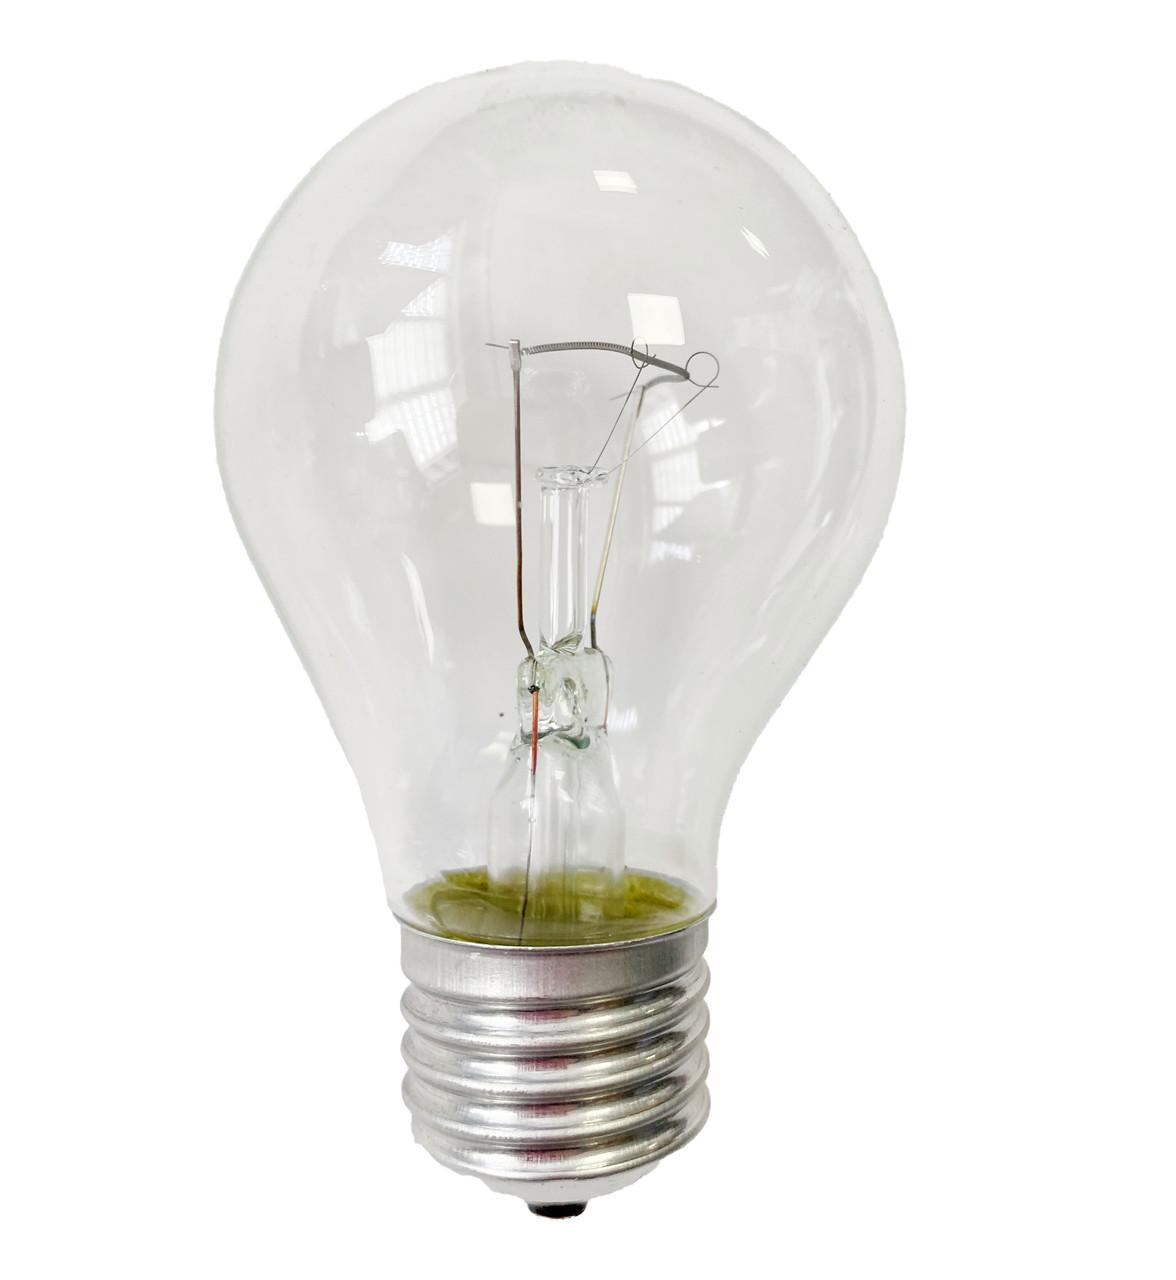 Электролампа низковольтная МО 36В 40Вт, цоколь Е27